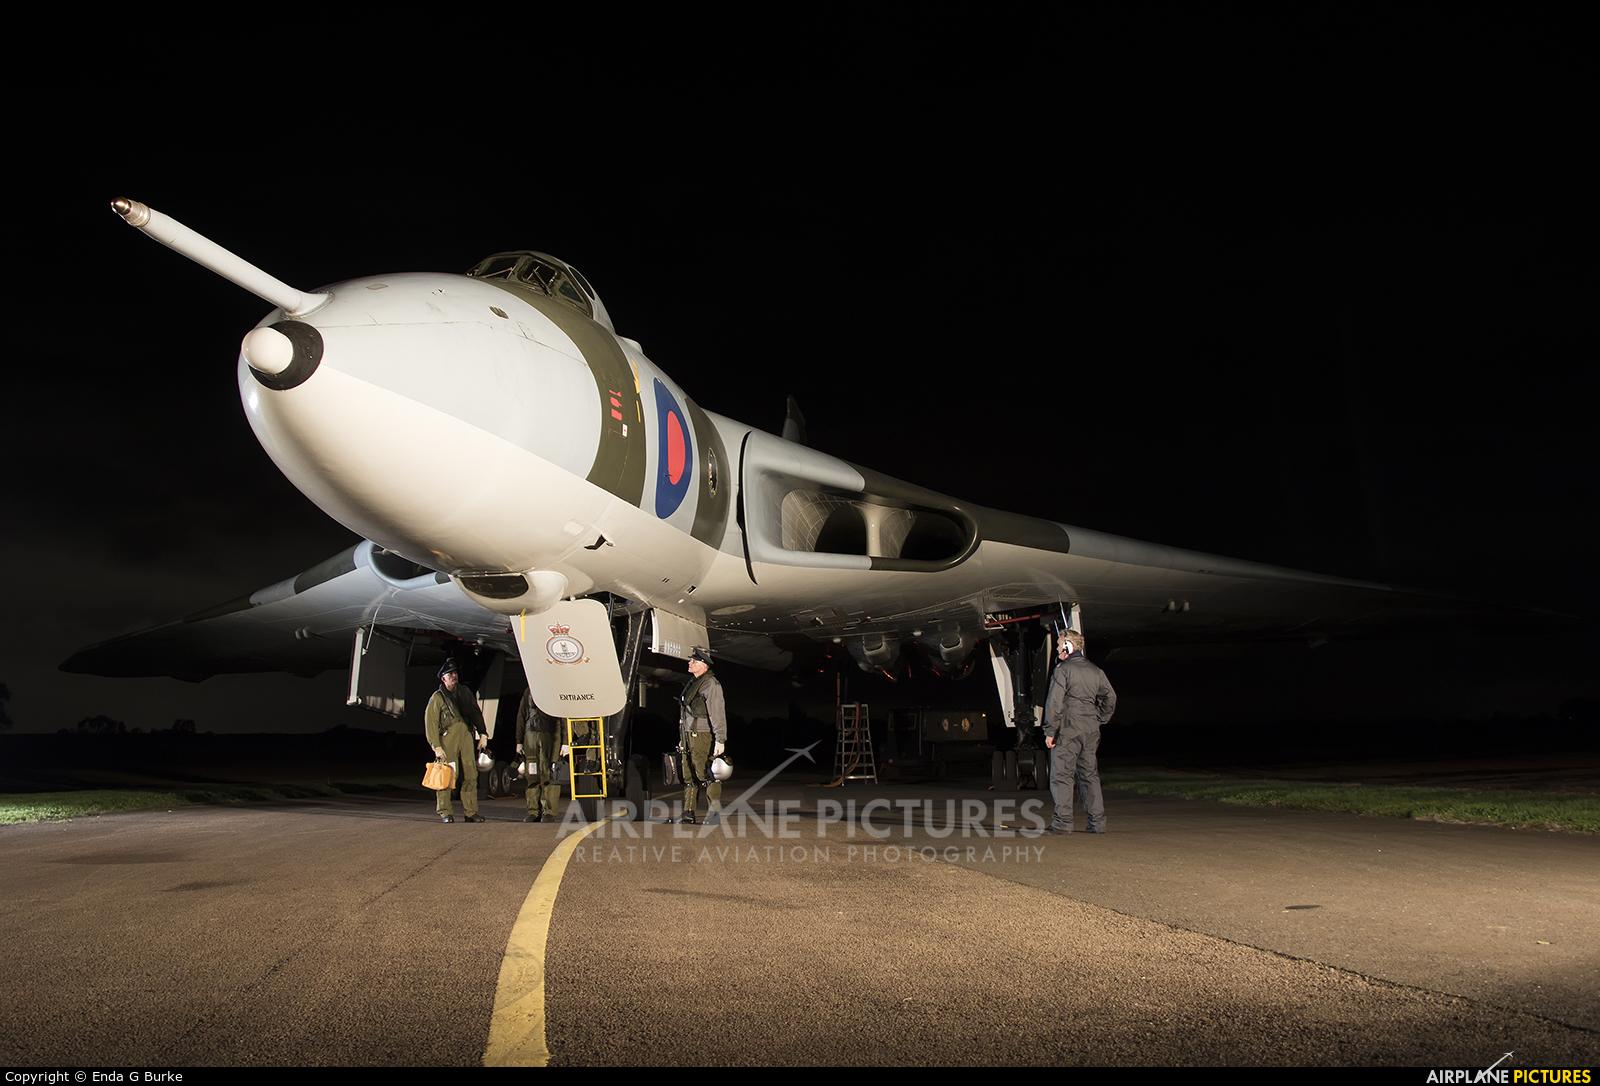 Royal Air Force XM655 aircraft at Wellesbourne Mountford